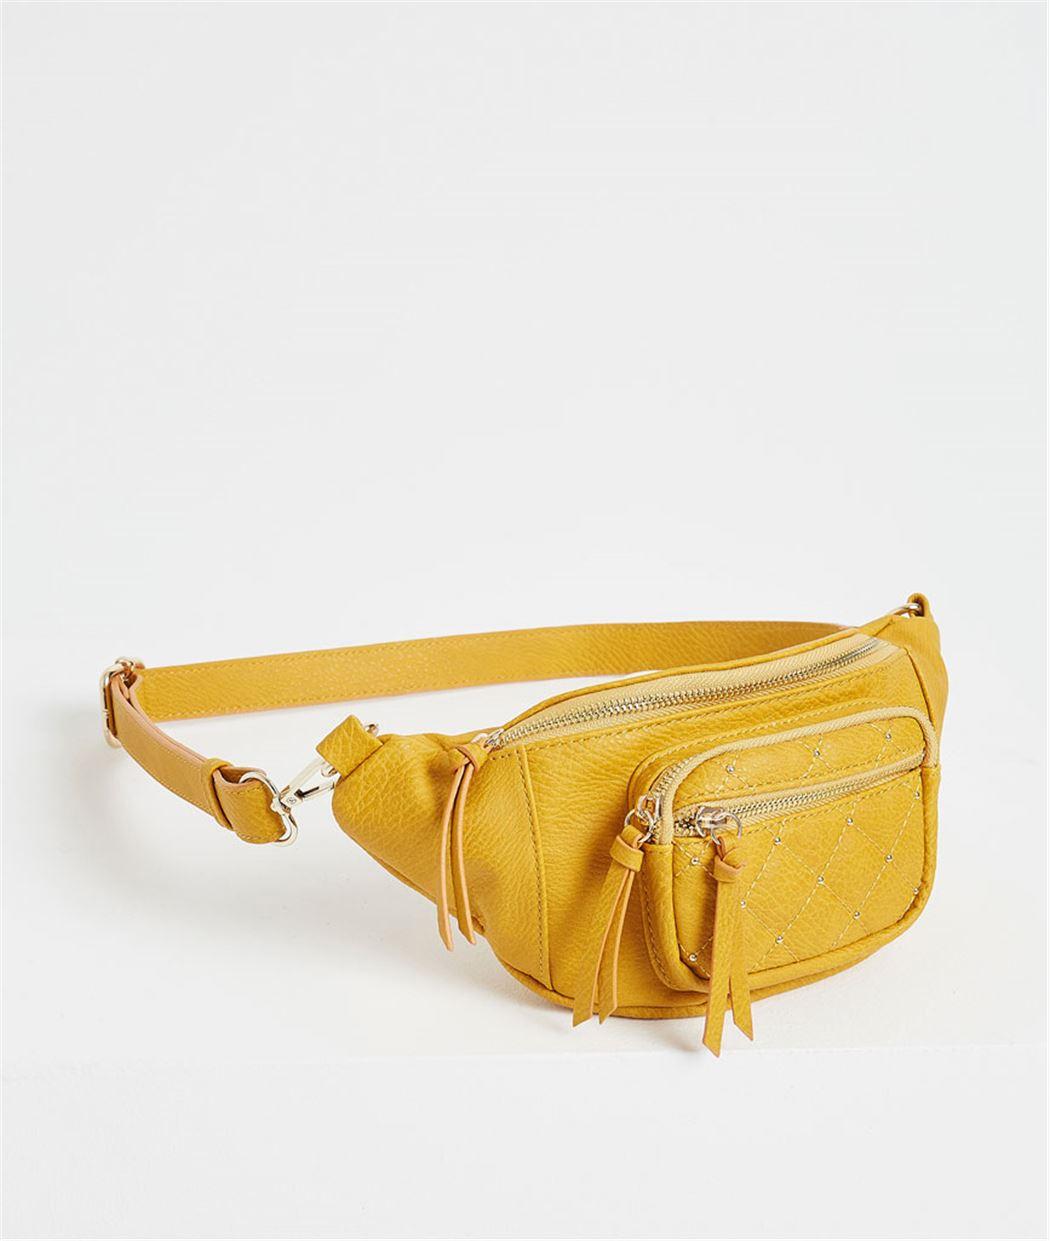 Sac banane femme jaune avec clous JAUNE